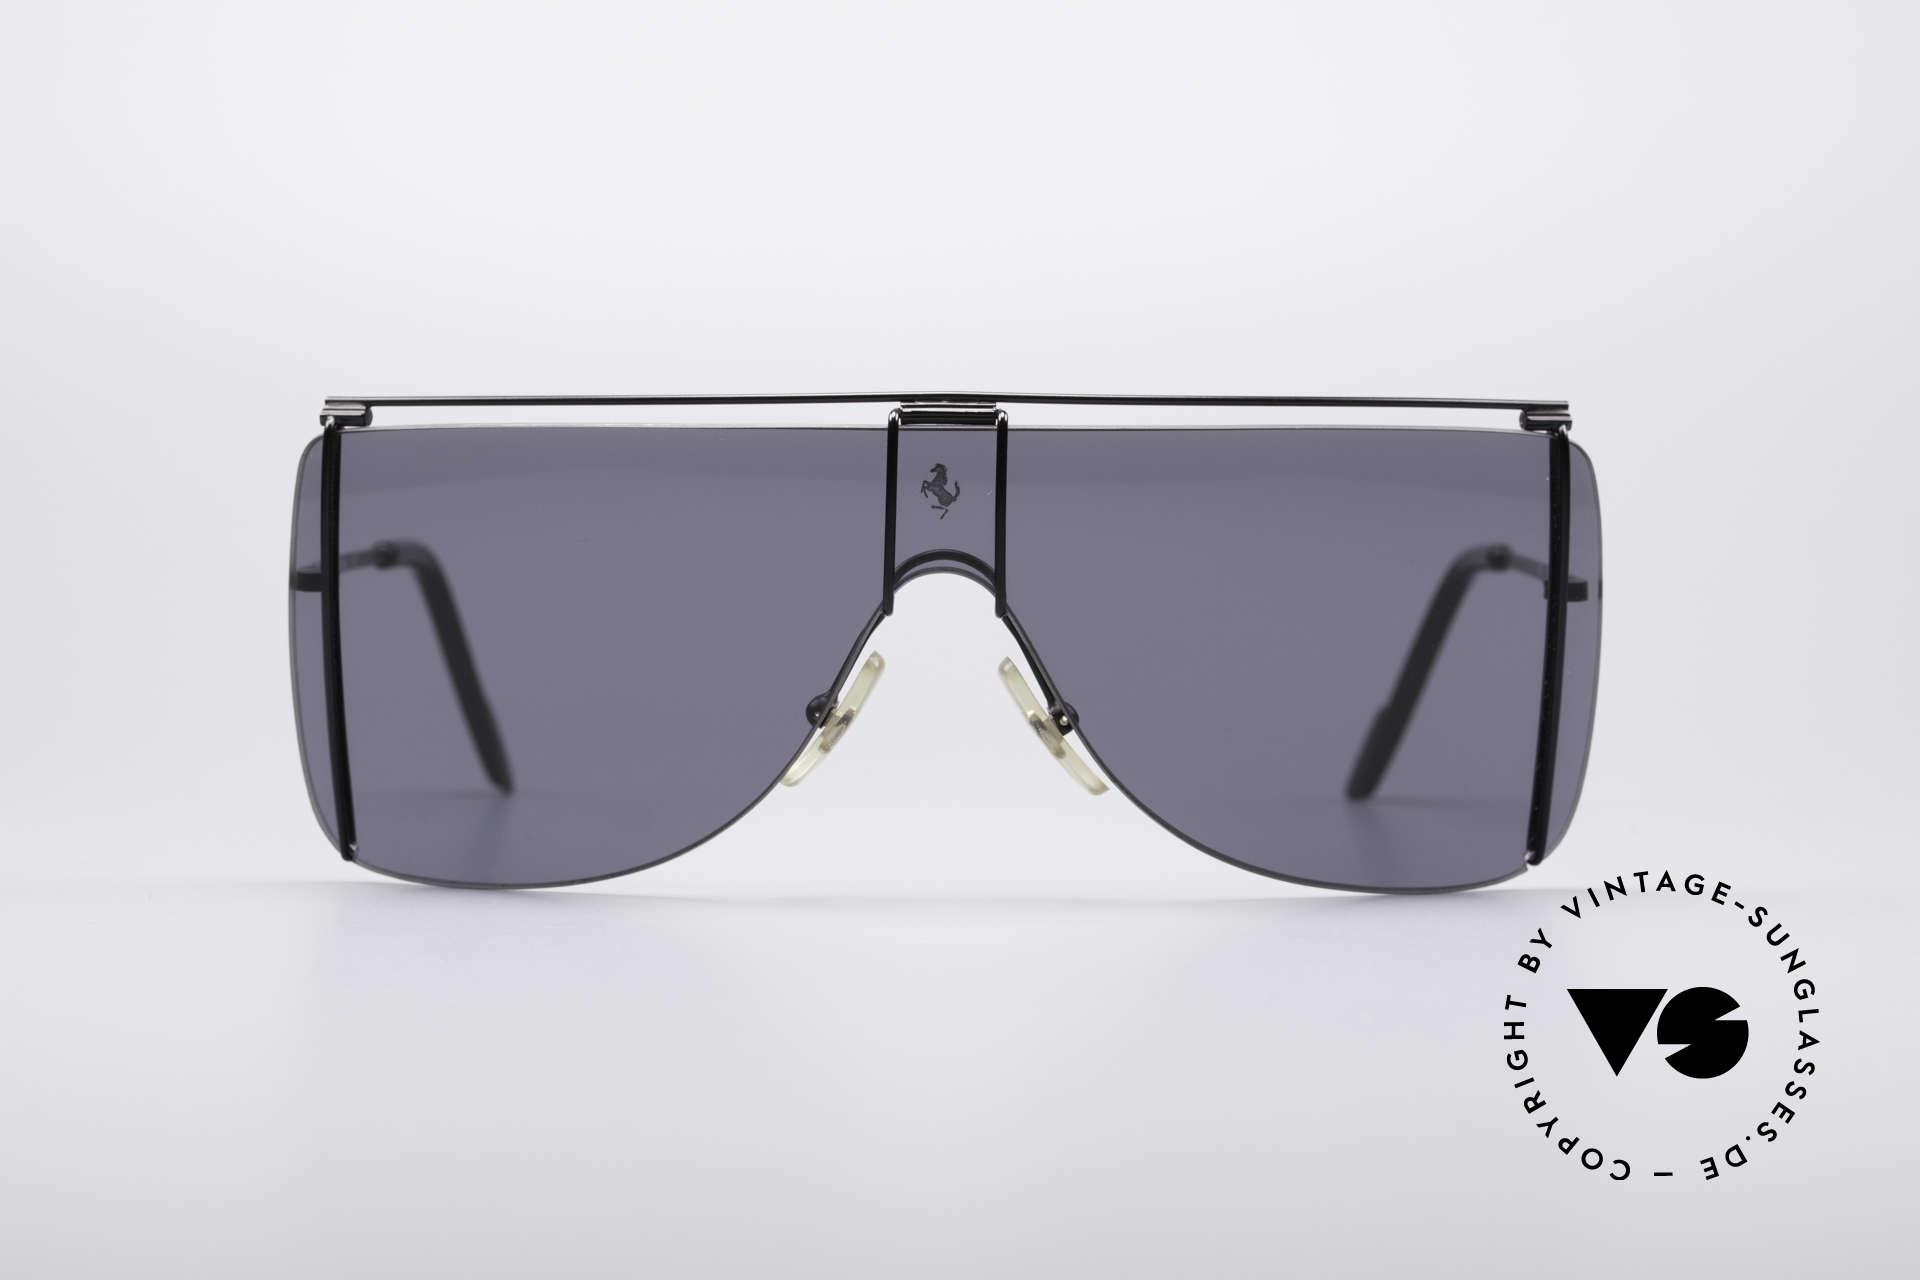 e2f2d957c4912 Sunglasses Ferrari F20 Luxury Sports Shades